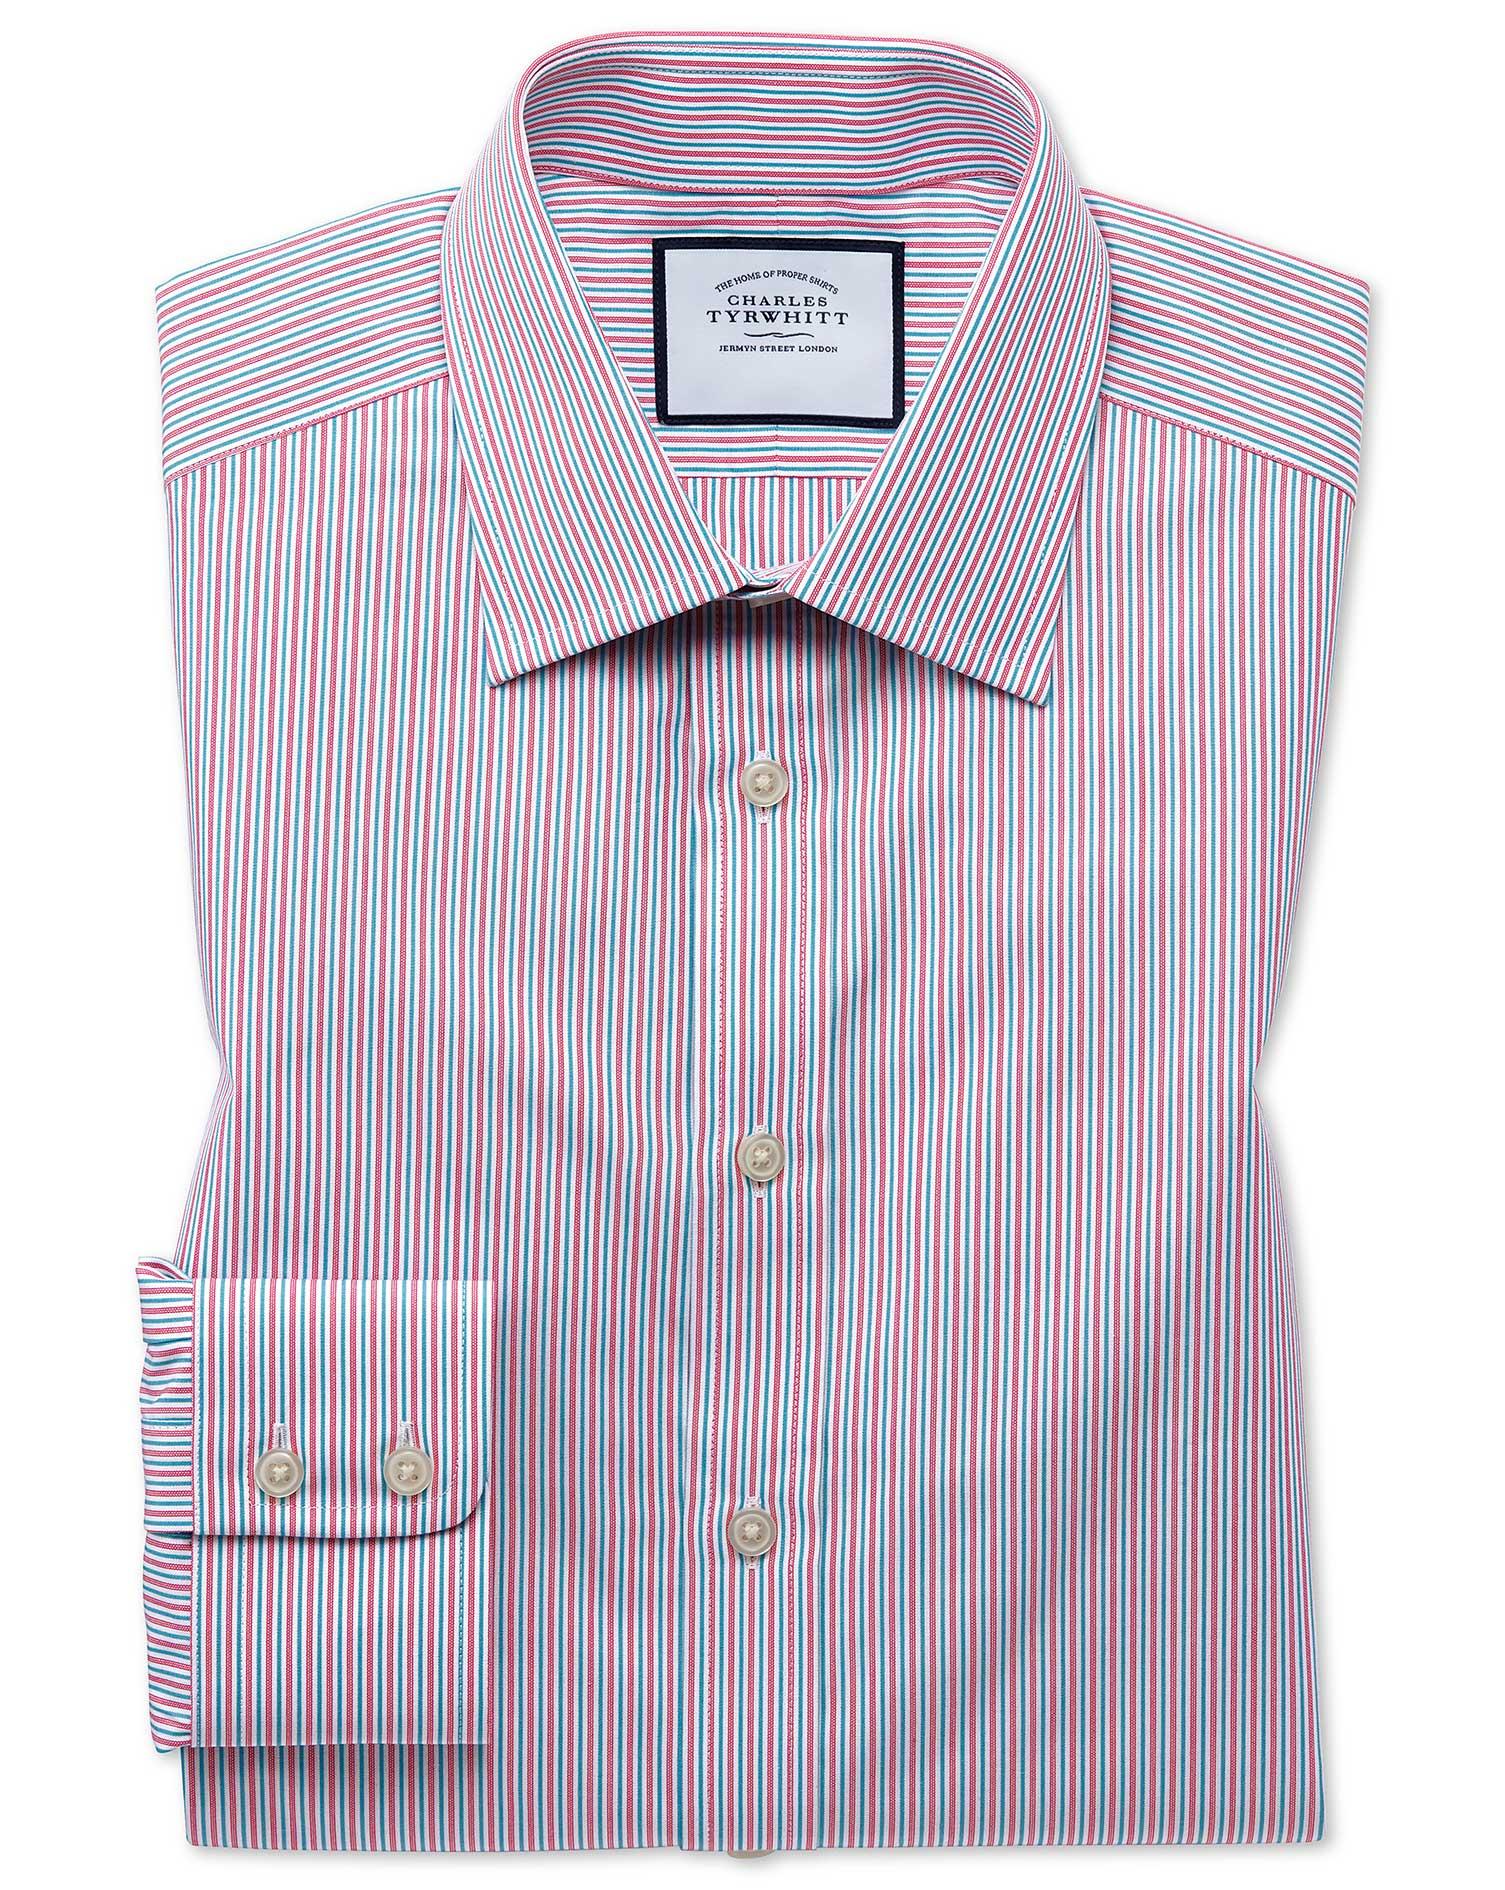 Slim Fit Egyptian Cotton Poplin Multi Pink Stripe Formal Shirt Single Cuff Size 16.5/33 by Charles T